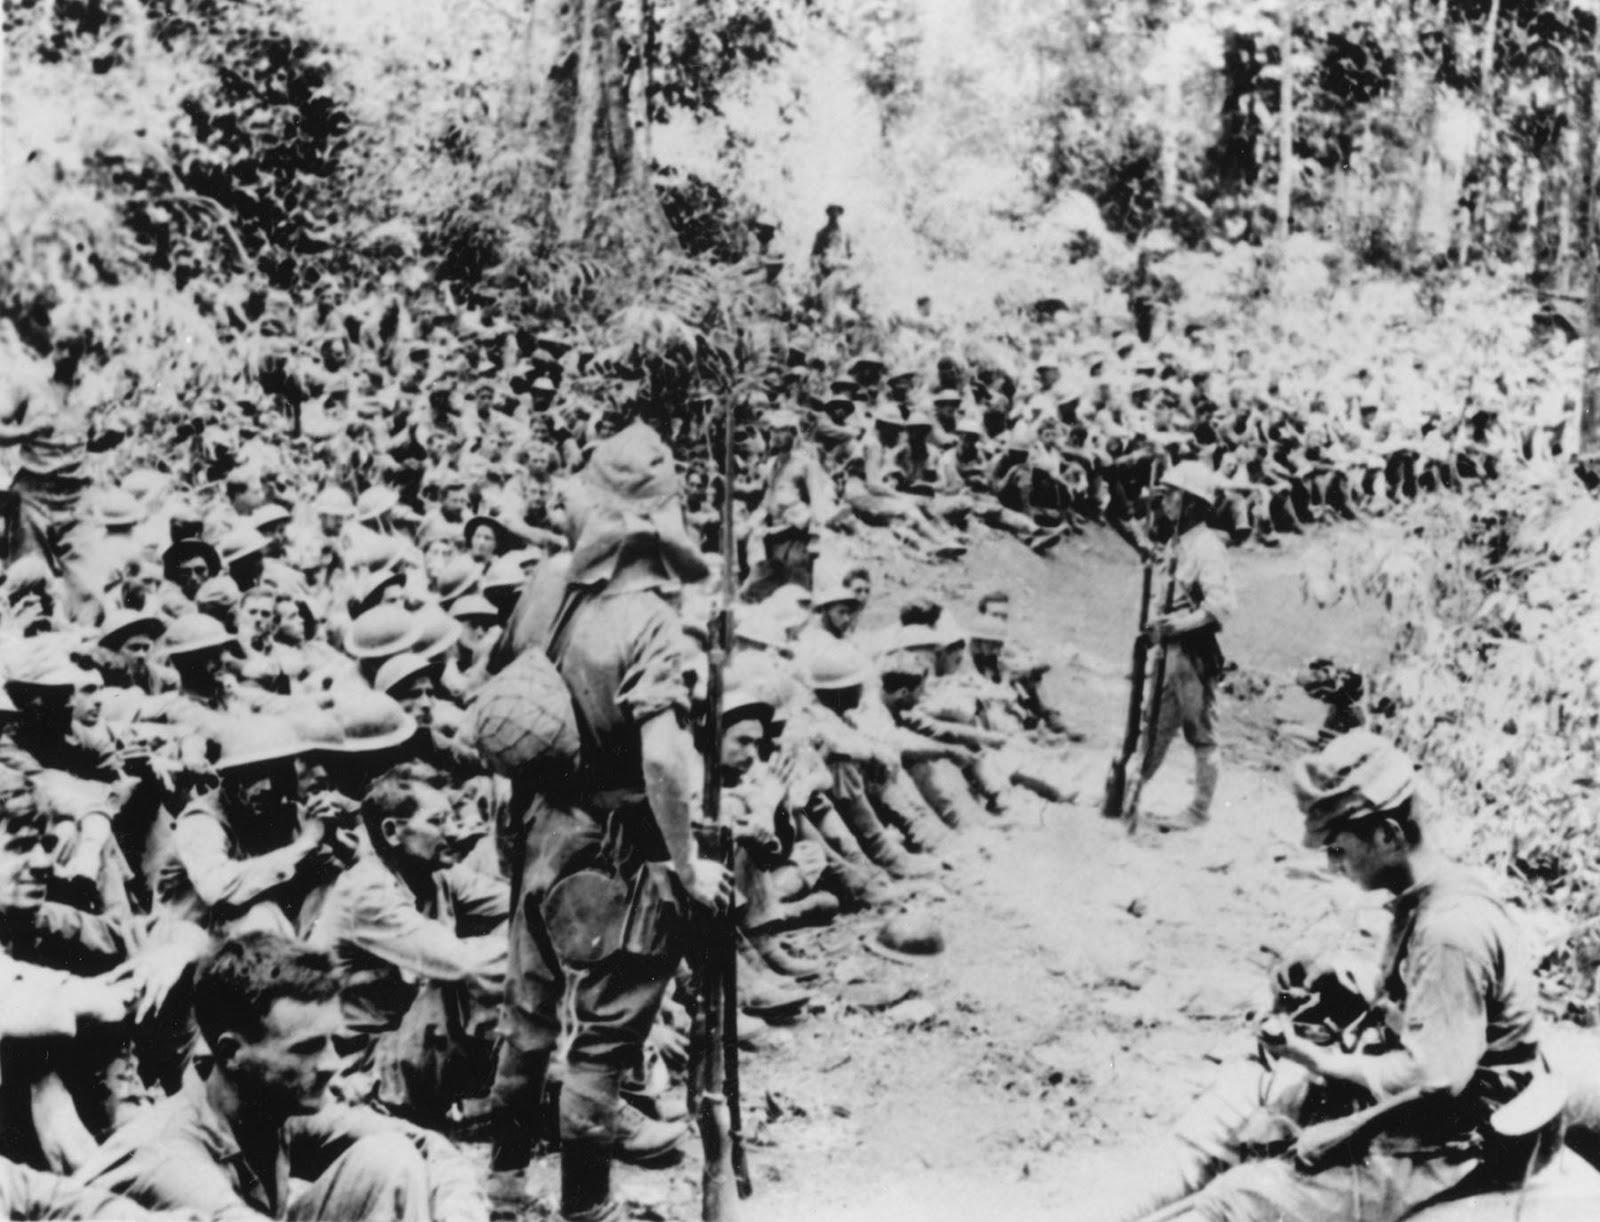 http://3.bp.blogspot.com/_4VXrkZe4WmU/TMI6usj1-kI/AAAAAAAAJoU/6Z7ONq_5biI/s1600/American+servicemen+begin+the+Death+March..jpg